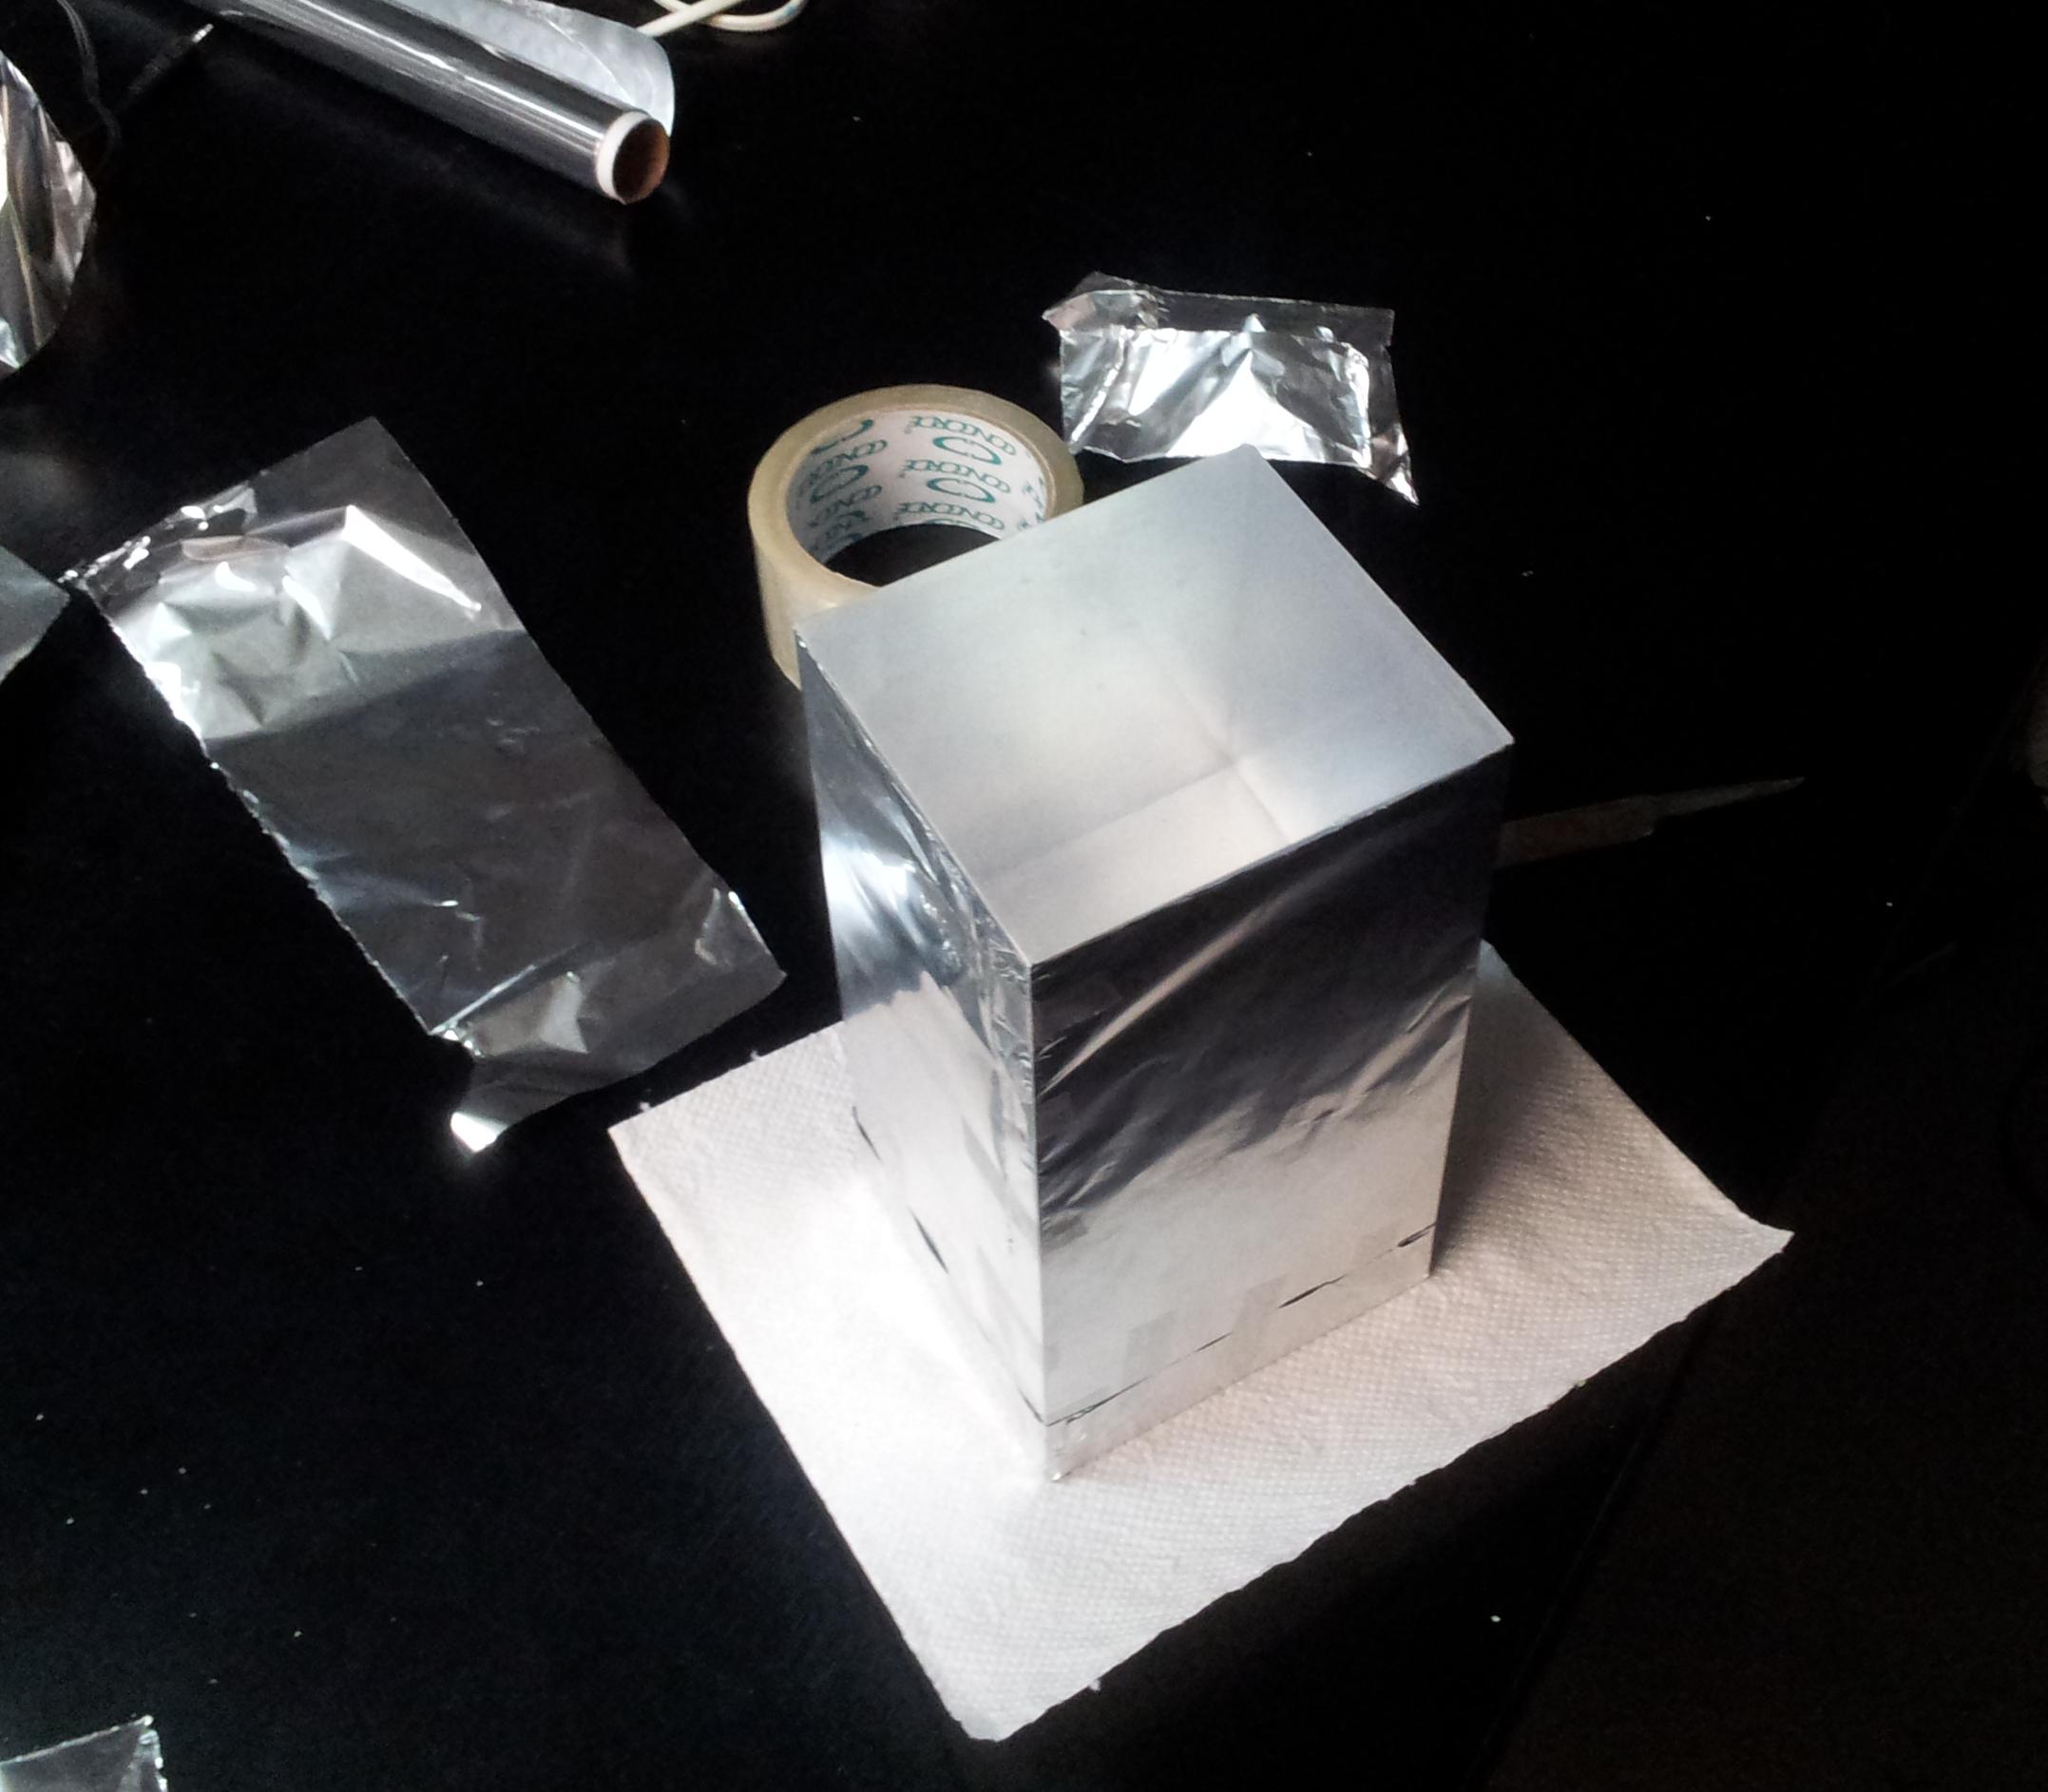 FAG wrapped in aluminium